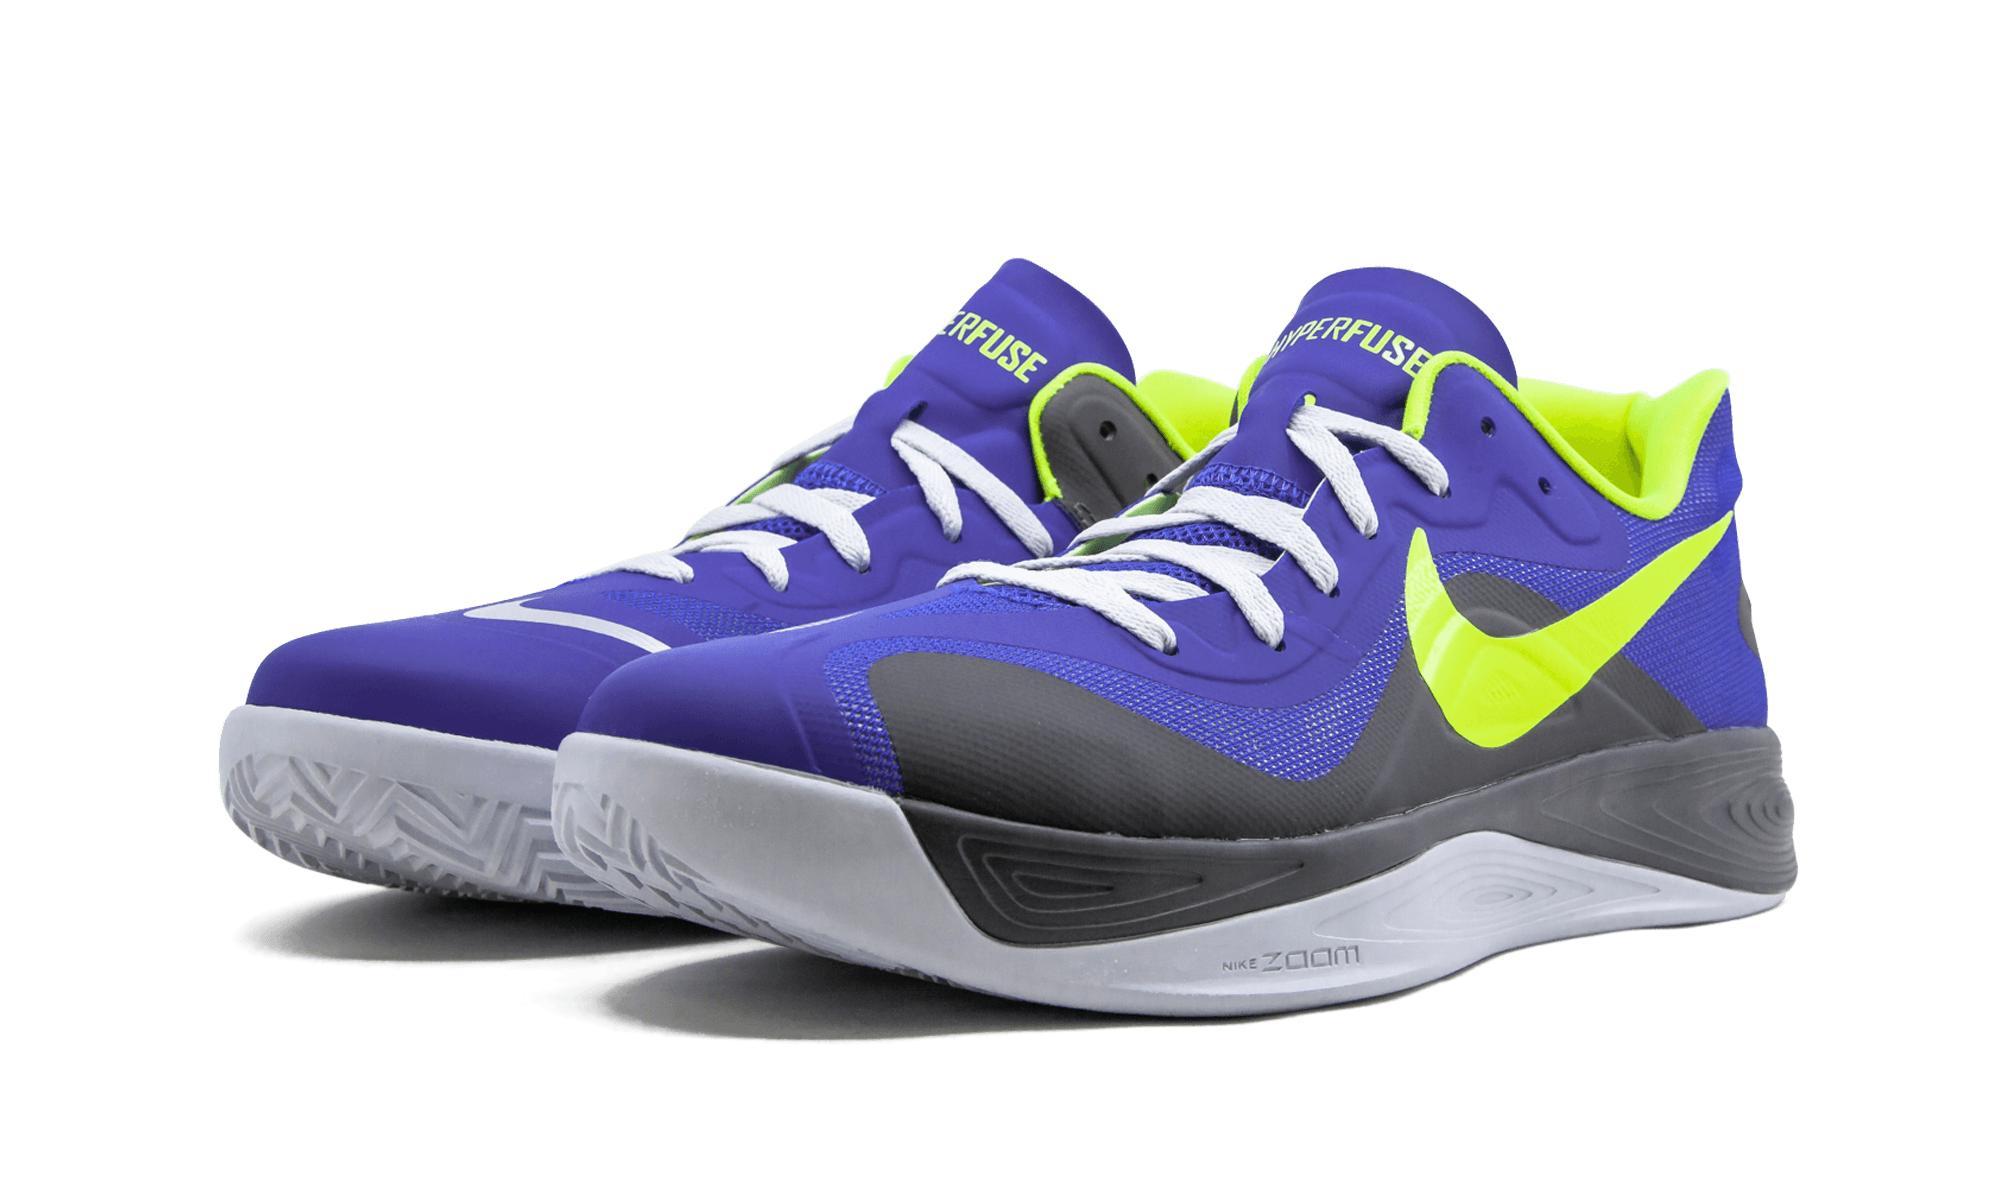 5f459a60f9b Nike - Blue Hyperfuse Low for Men - Lyst. View fullscreen